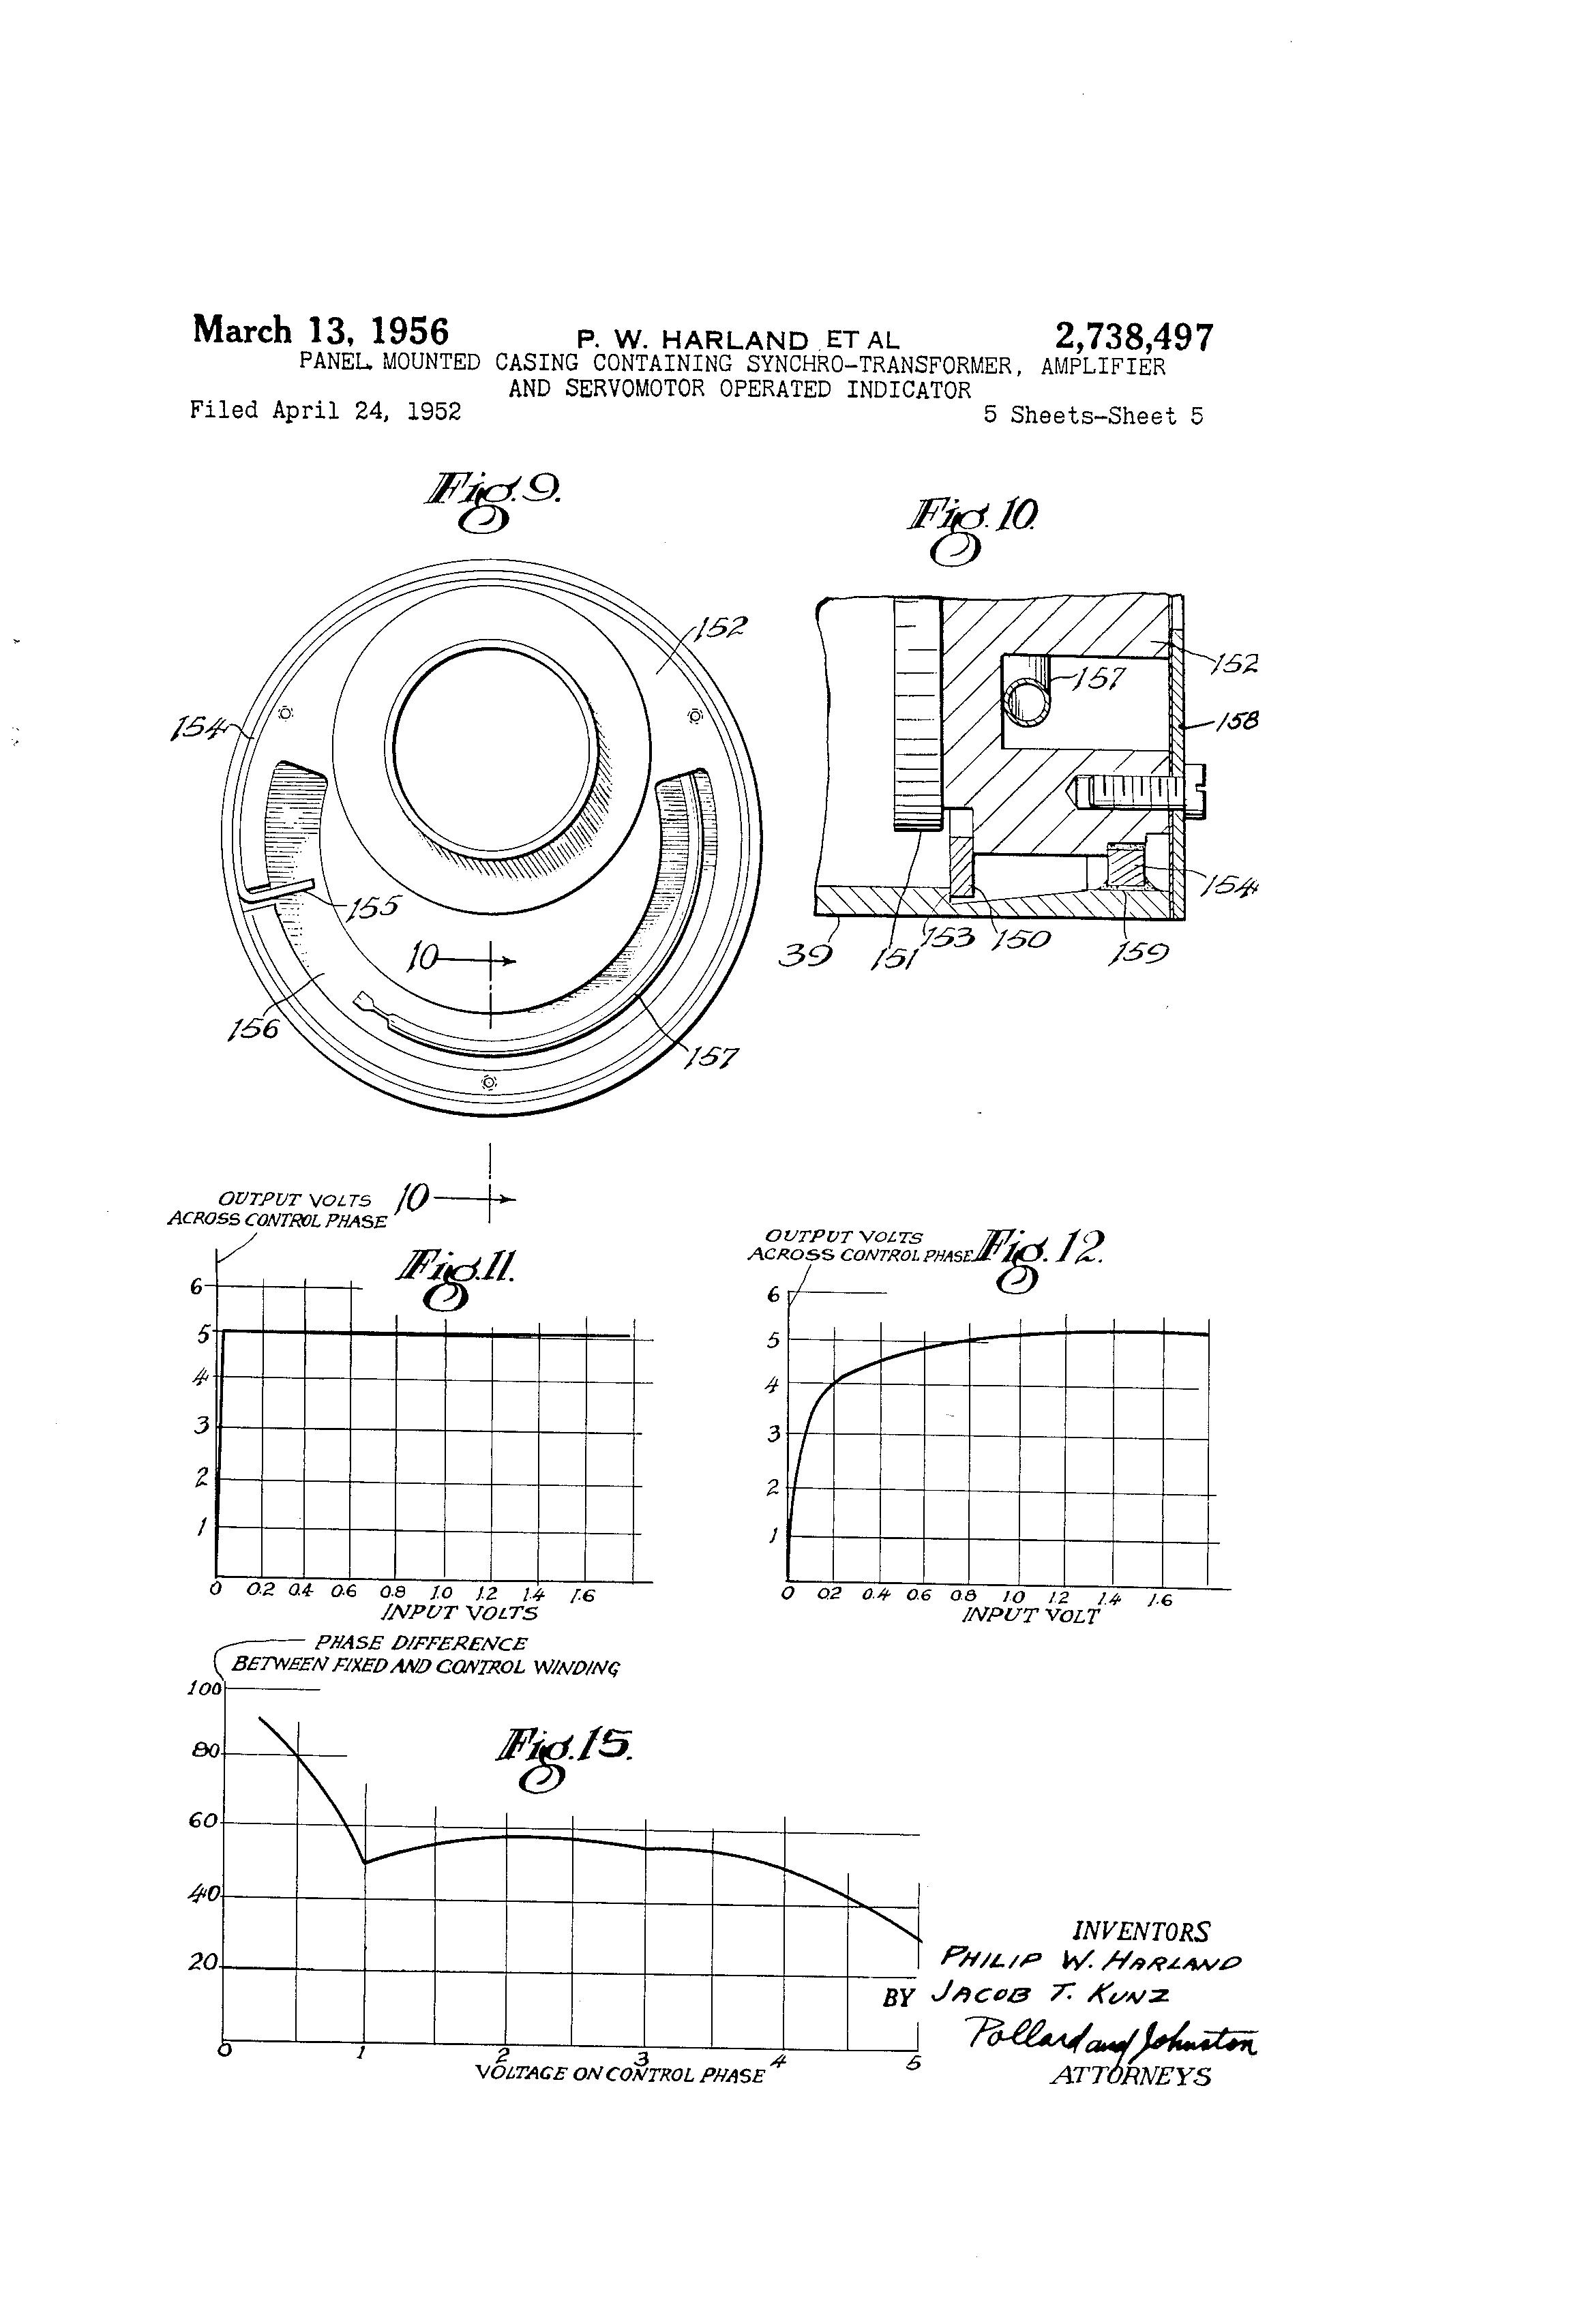 mars wiring diagram mars automotive wiring diagrams description us2738497 4 mars wiring diagram